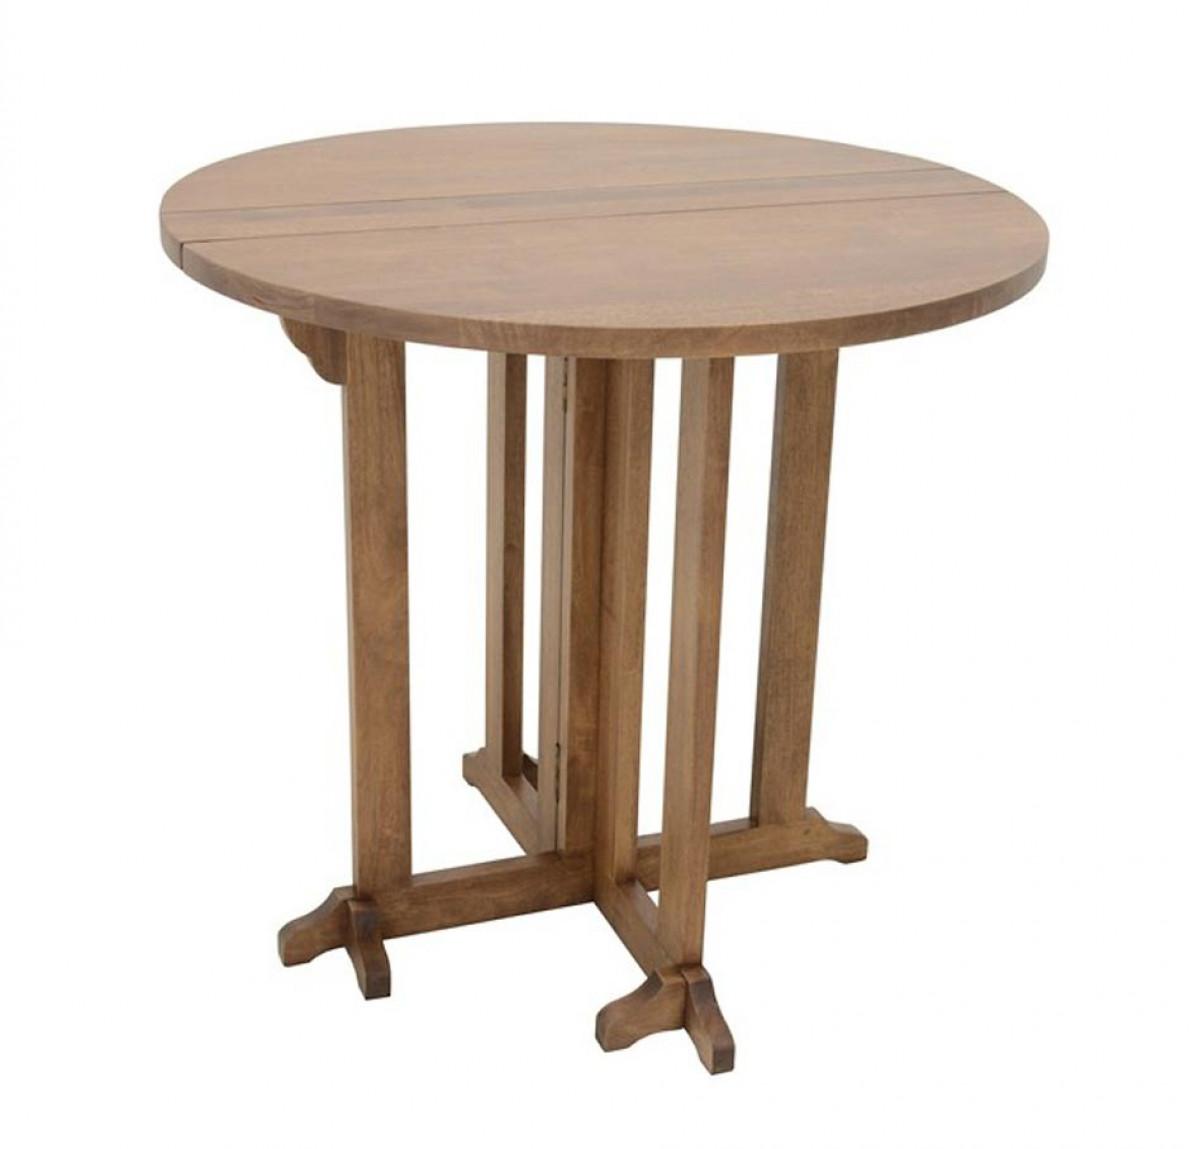 table avec plateaux a rabat hevea massif